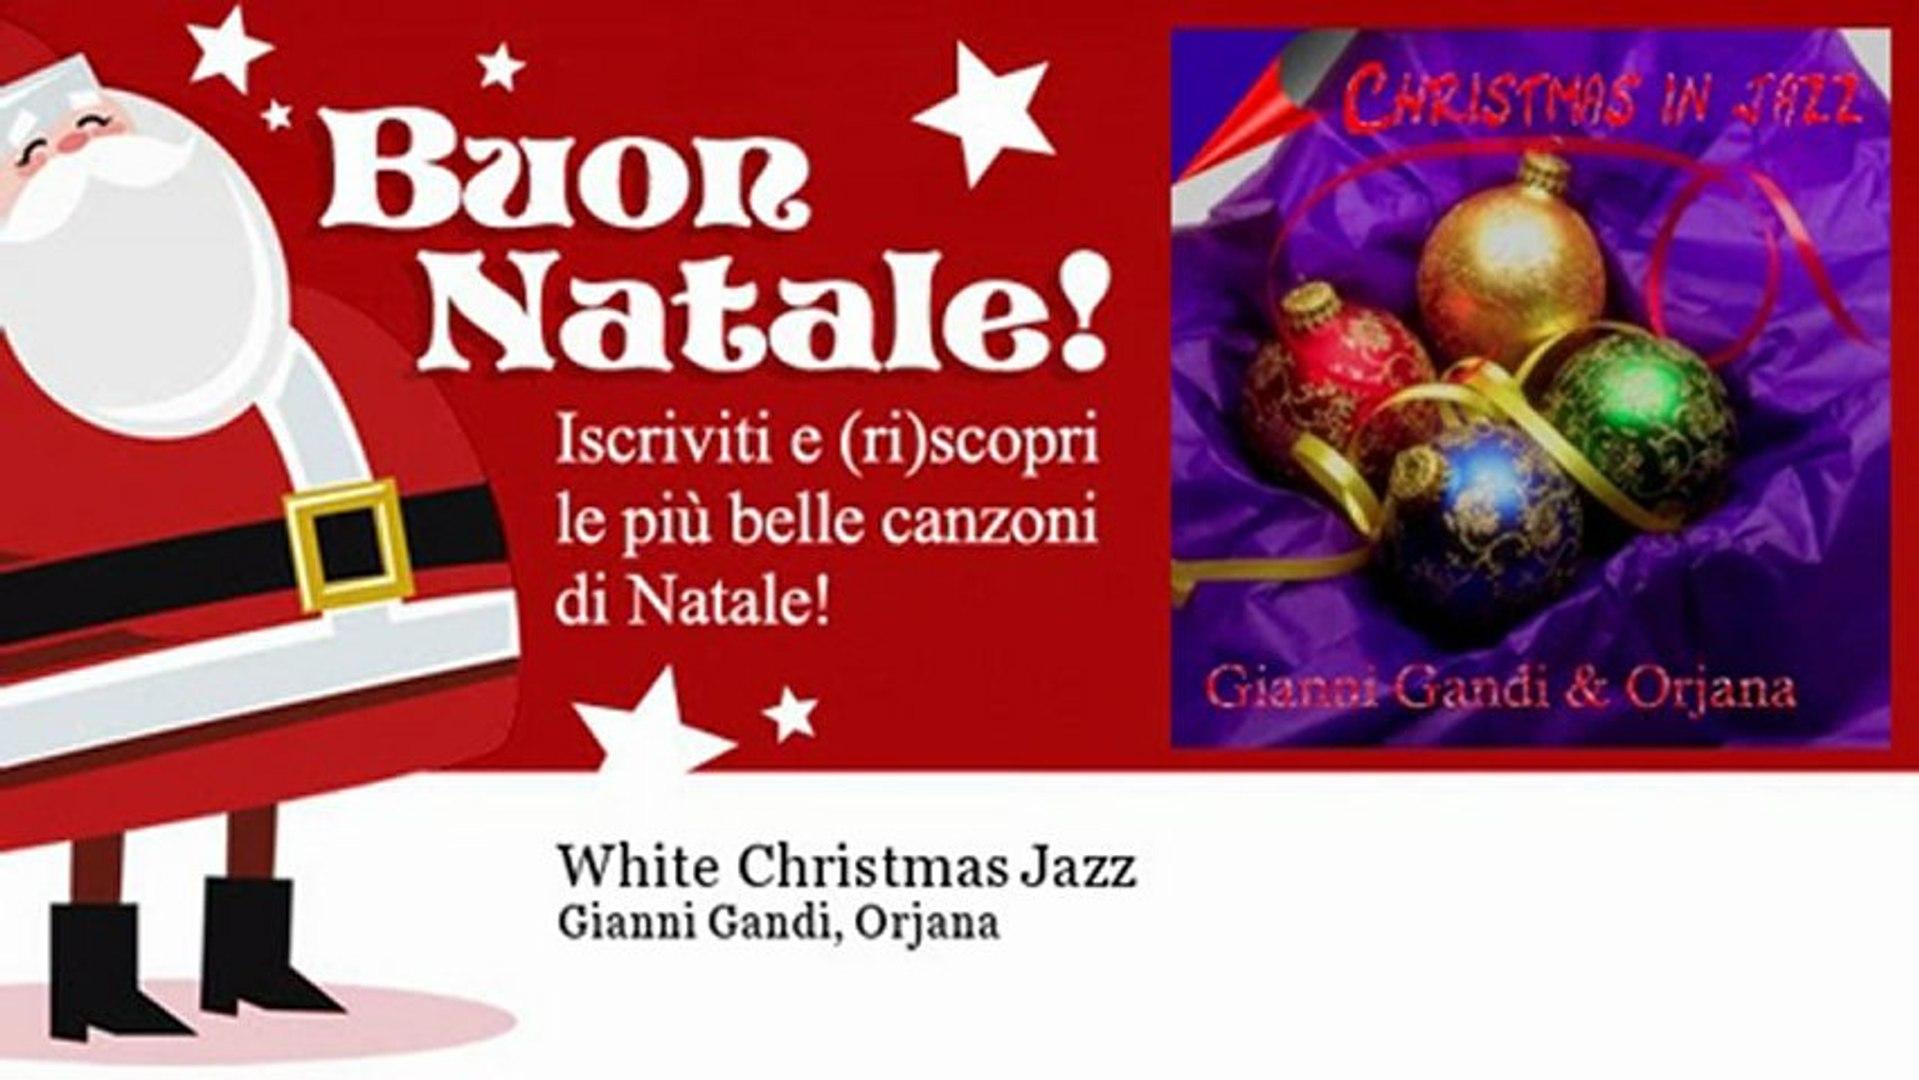 Gianni Gandi, Orjana - White Christmas Jazz - Natale